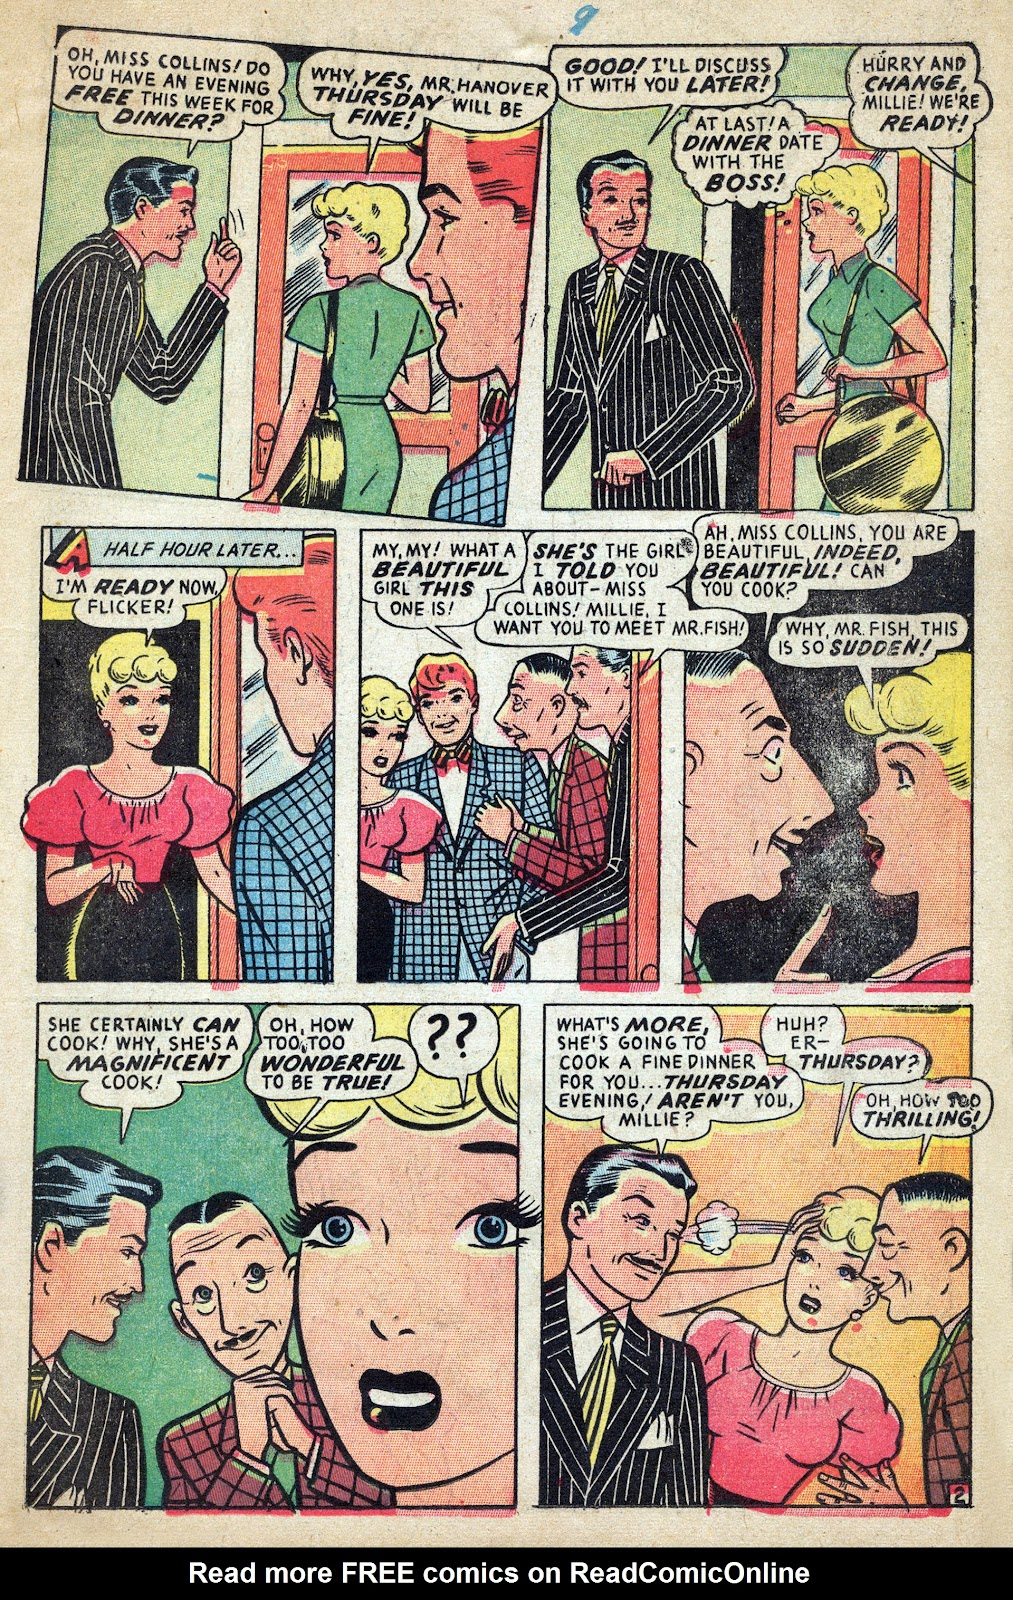 Read online Gay Comics comic -  Issue #31 - 11